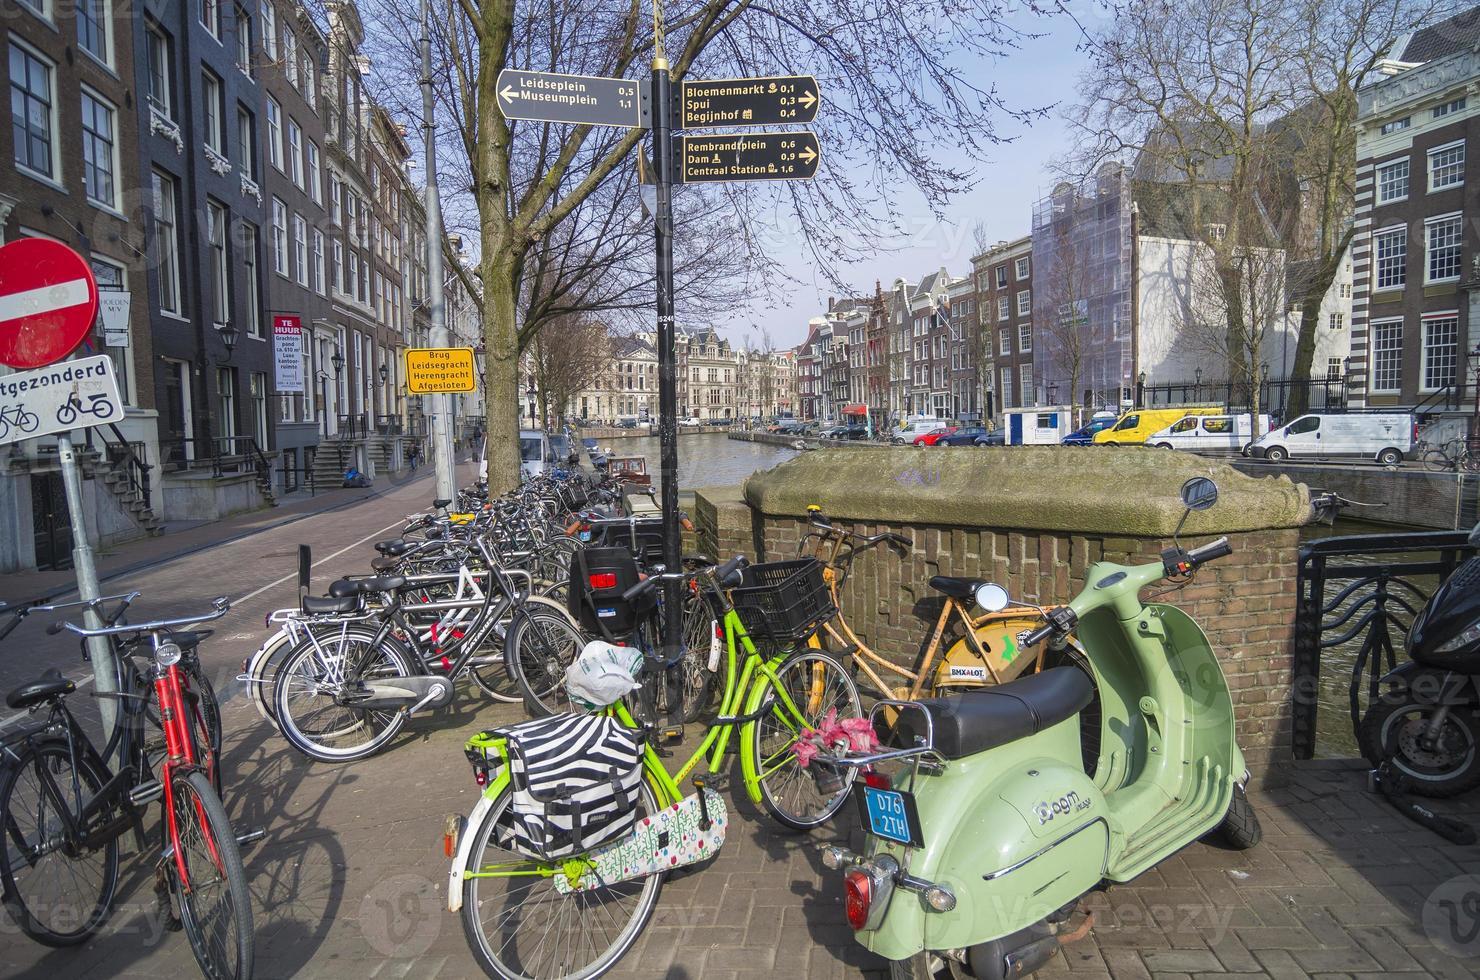 cykelparkering vid kanalen, Amsterdam. foto